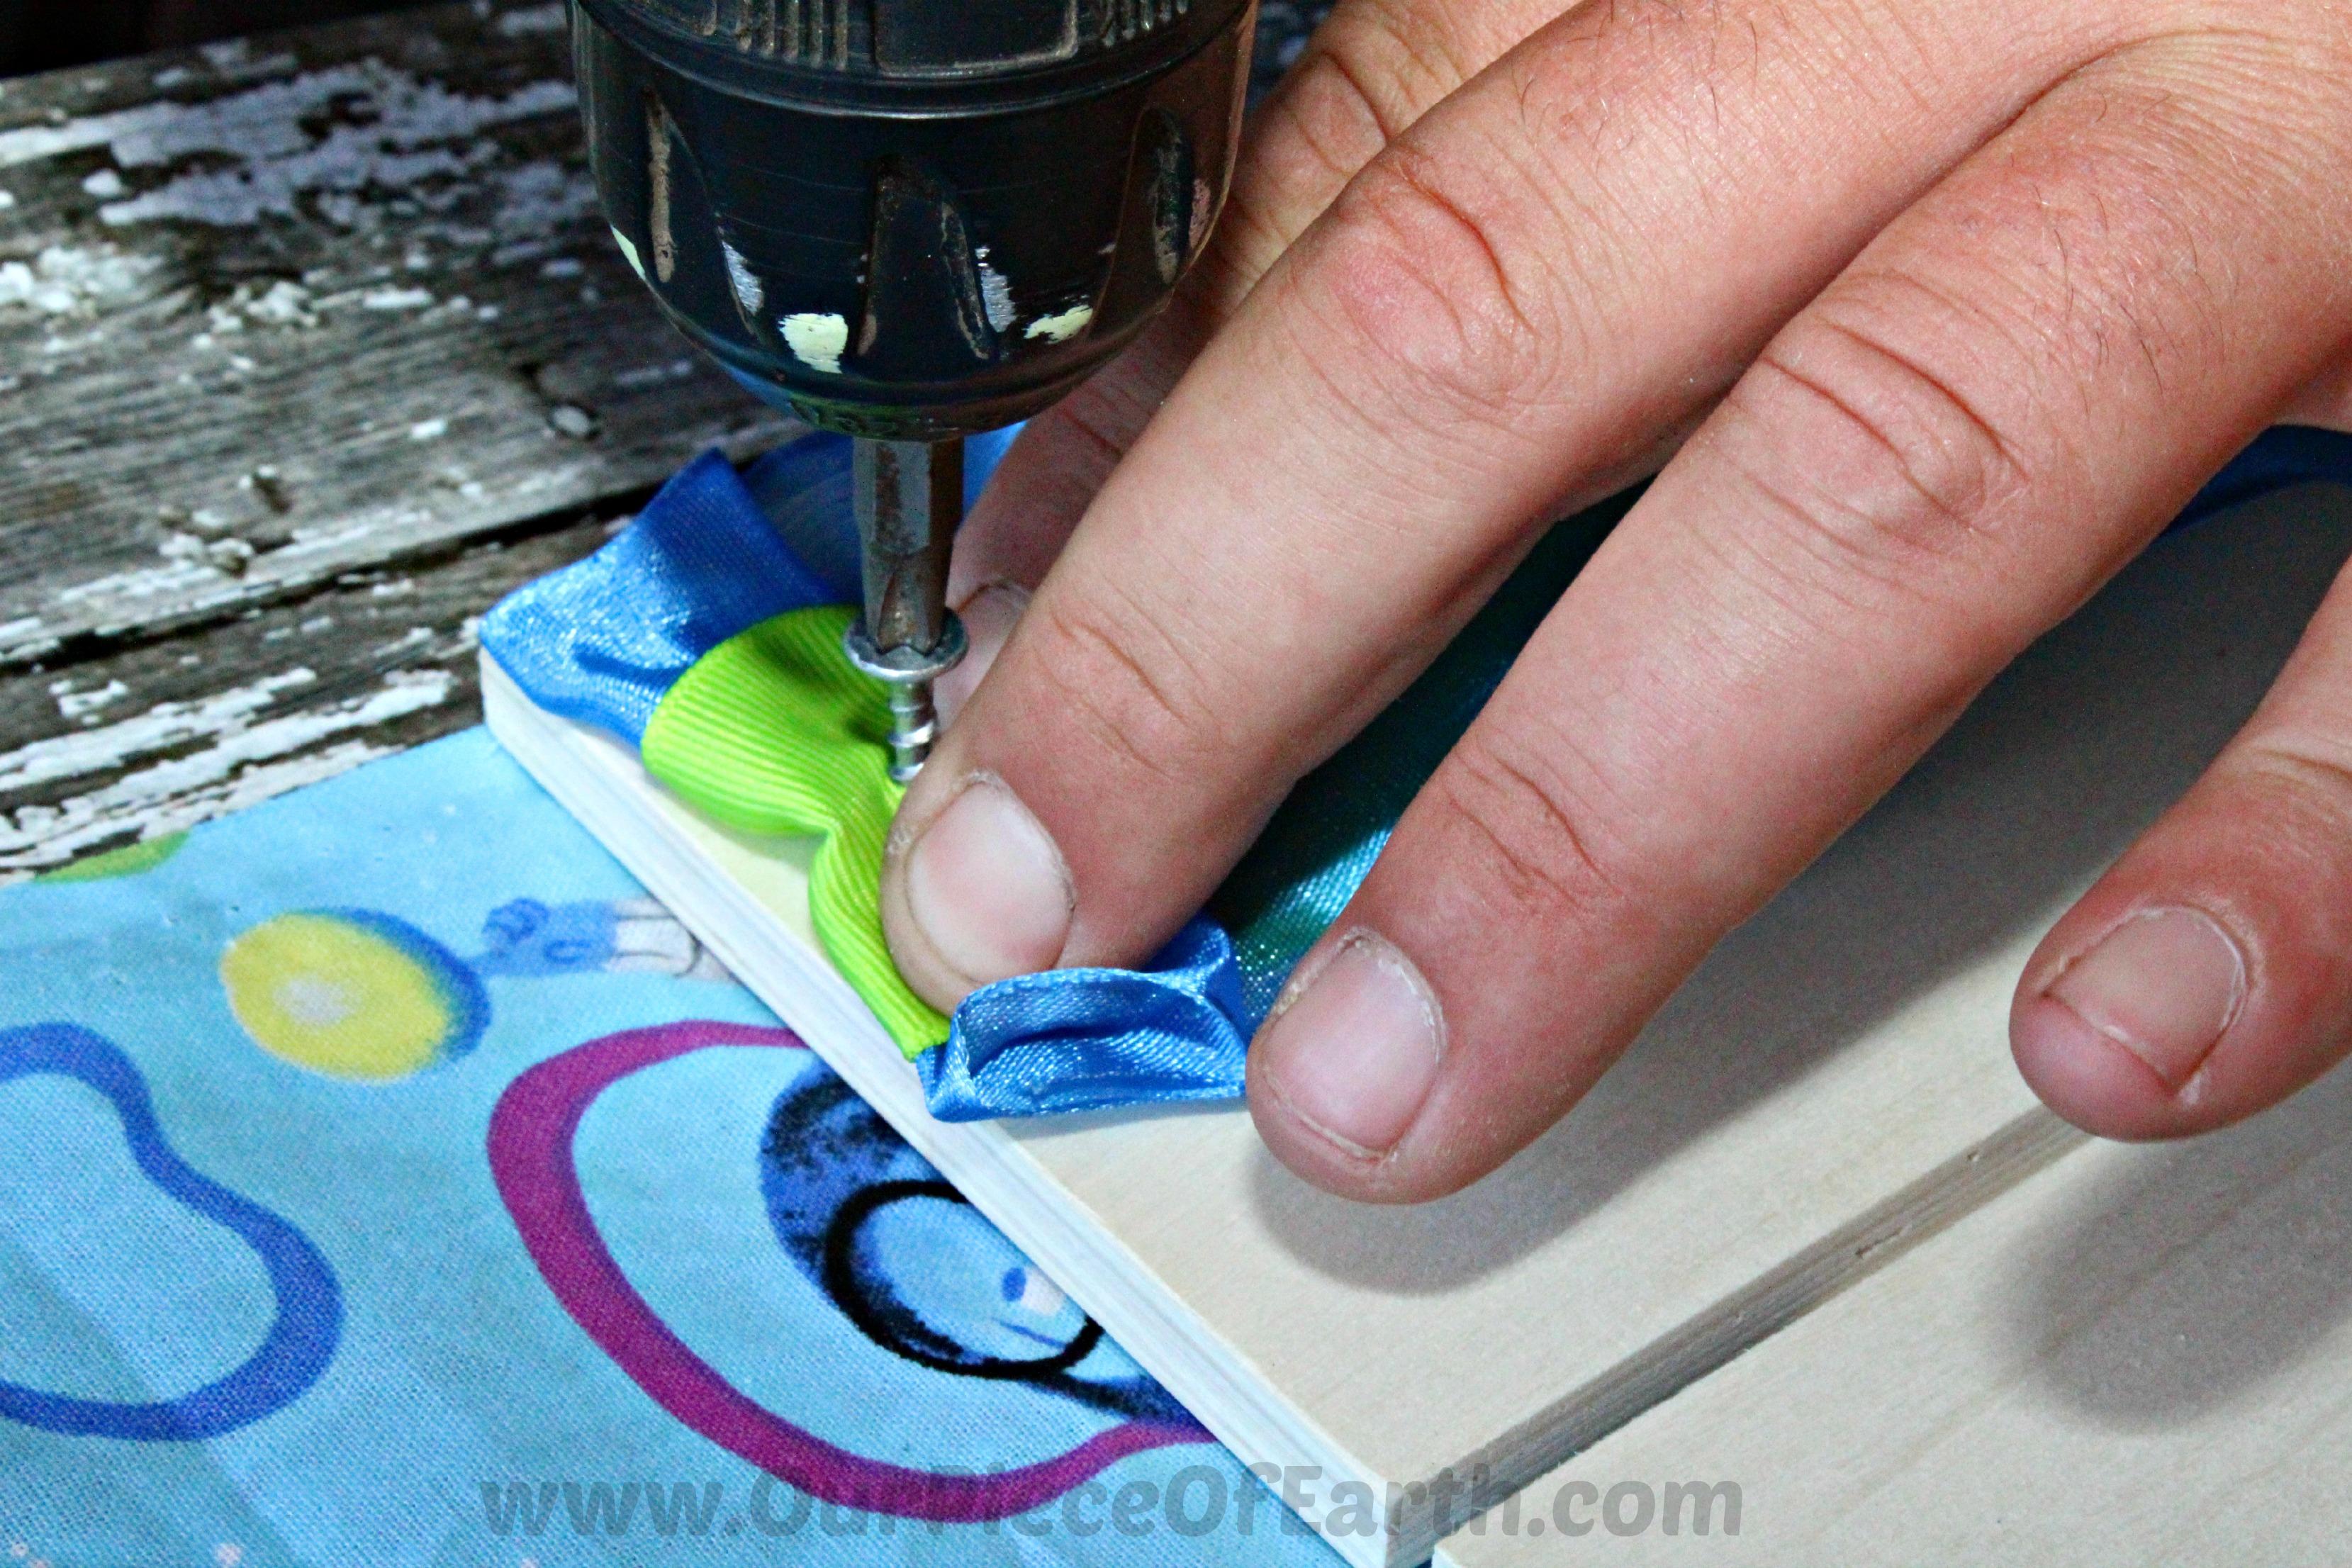 Inside Out screws